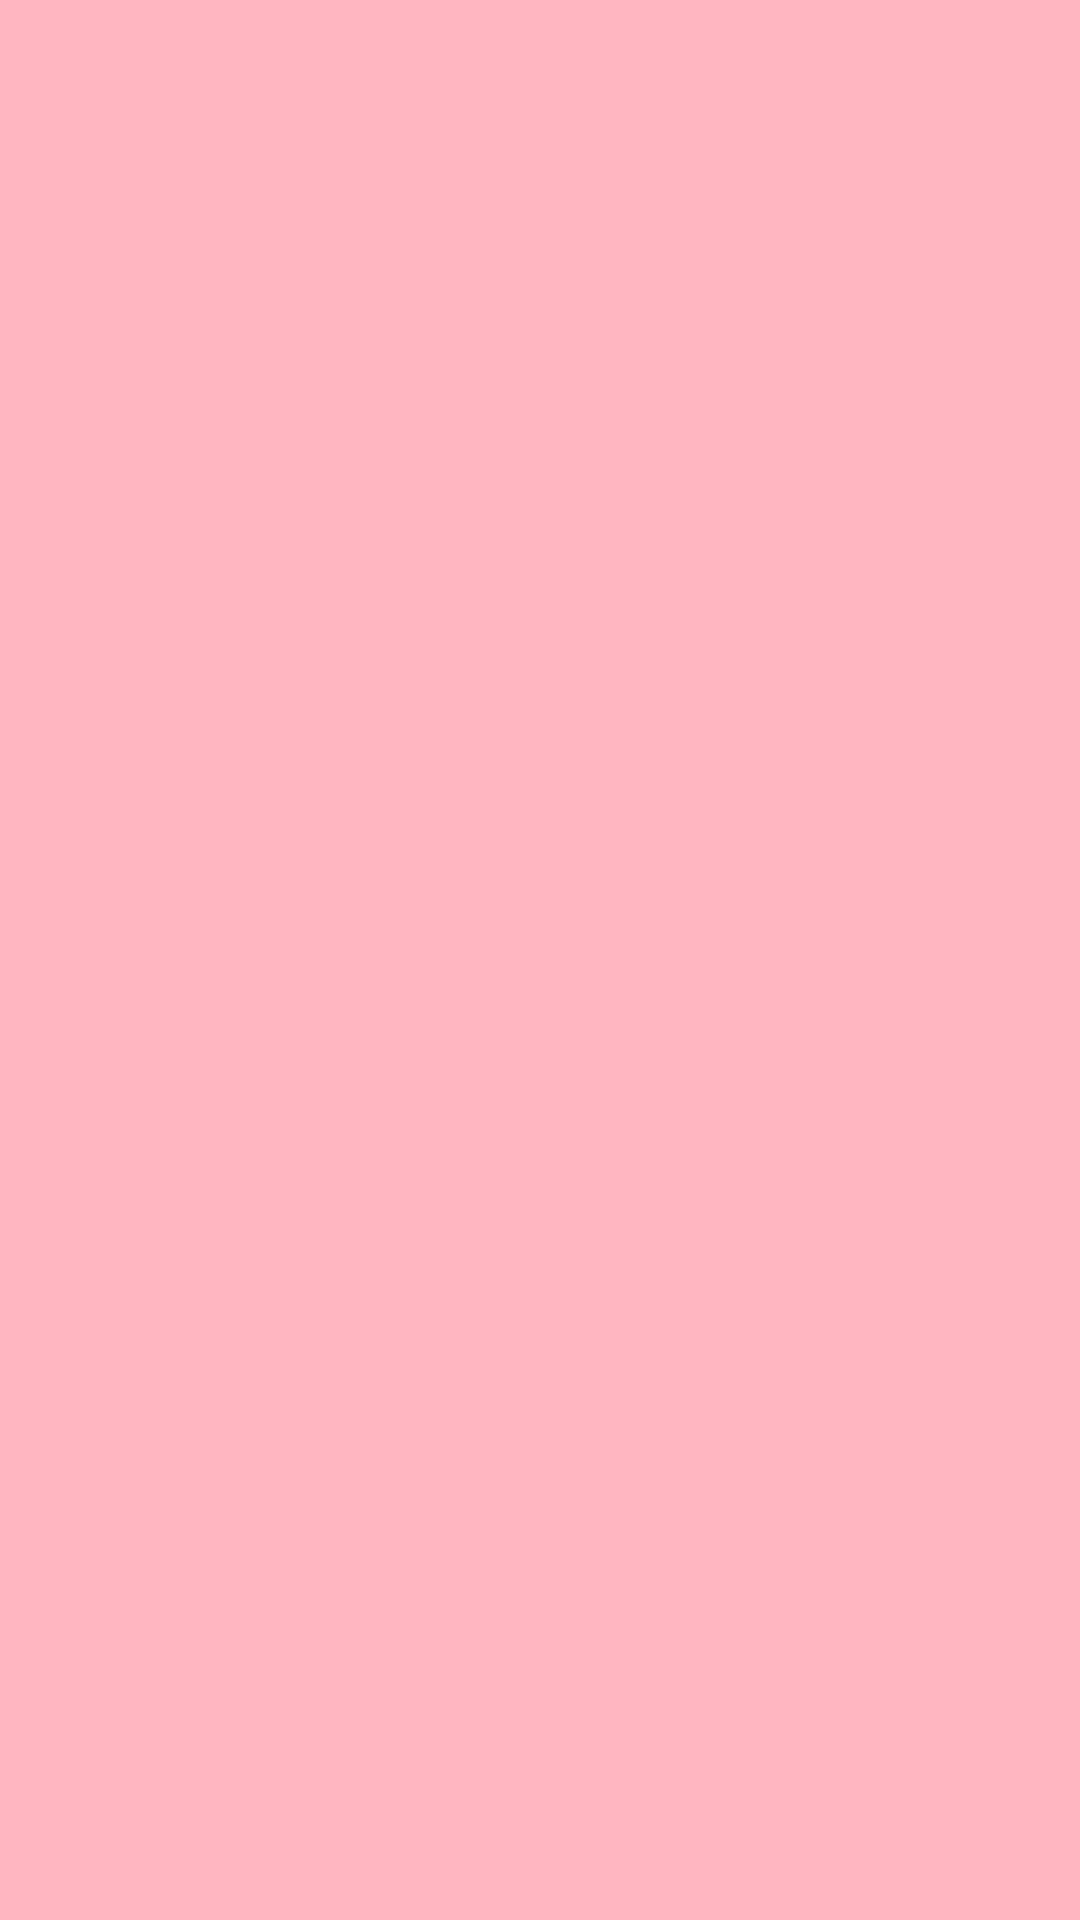 Light pink wallpaper วอลเปเปอร์, ทาสี, แพนโทน